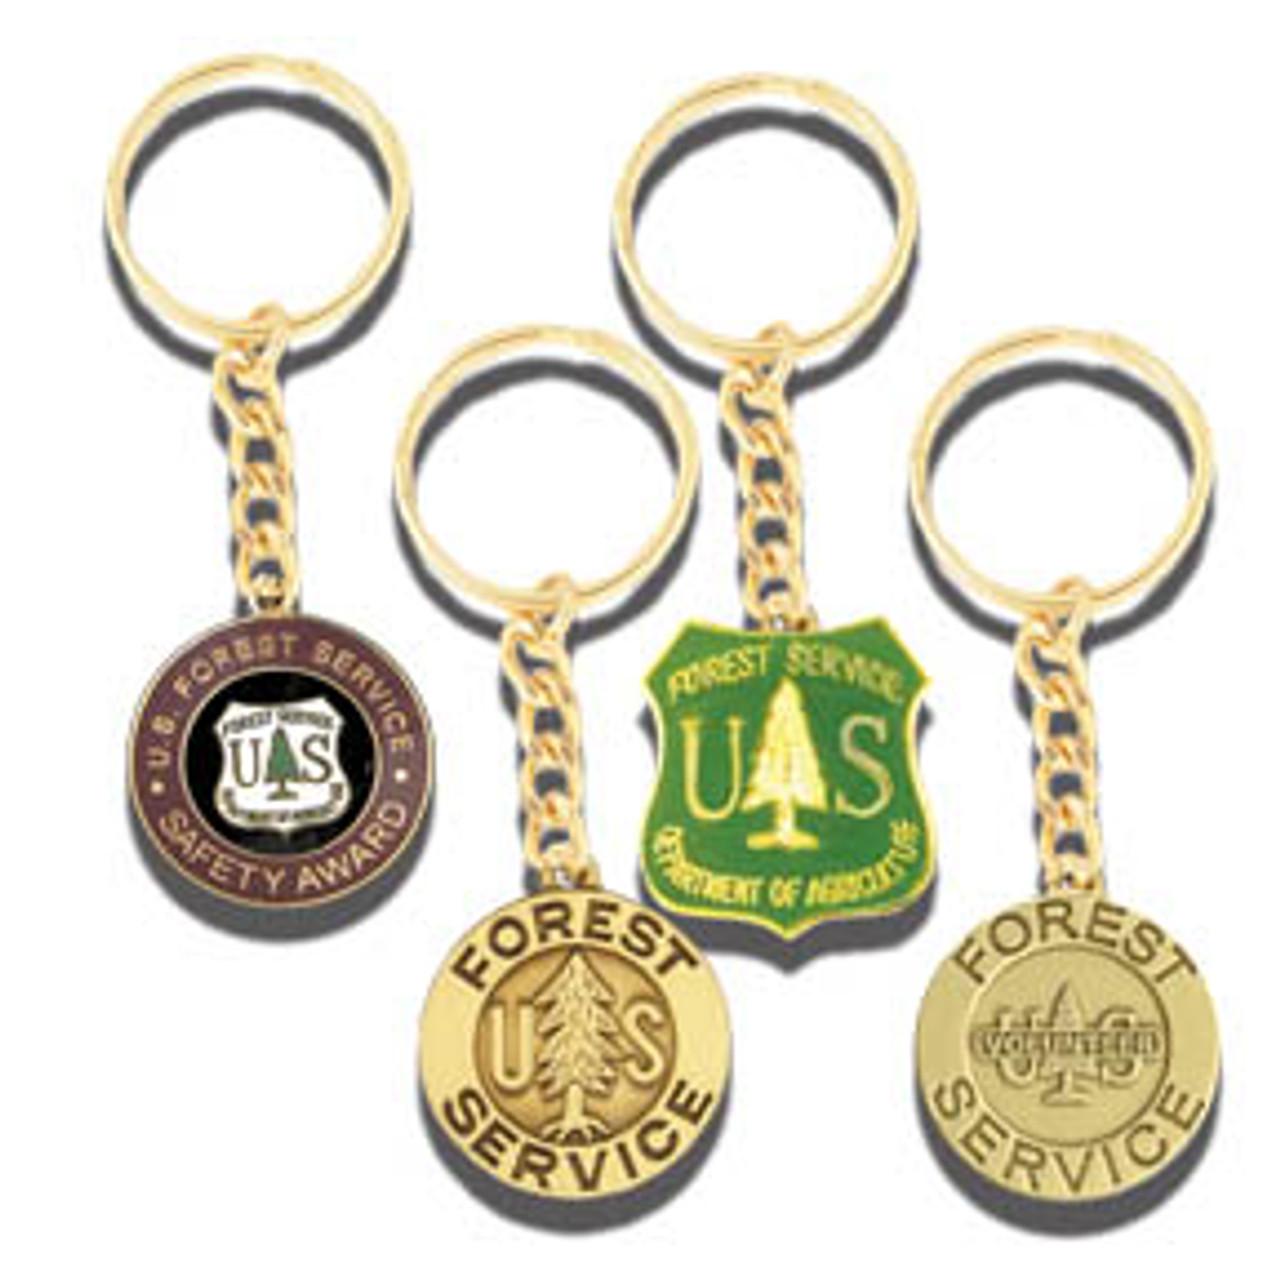 Custom Stamped Keychains - Please contact Nicole: art@westernheritage.com